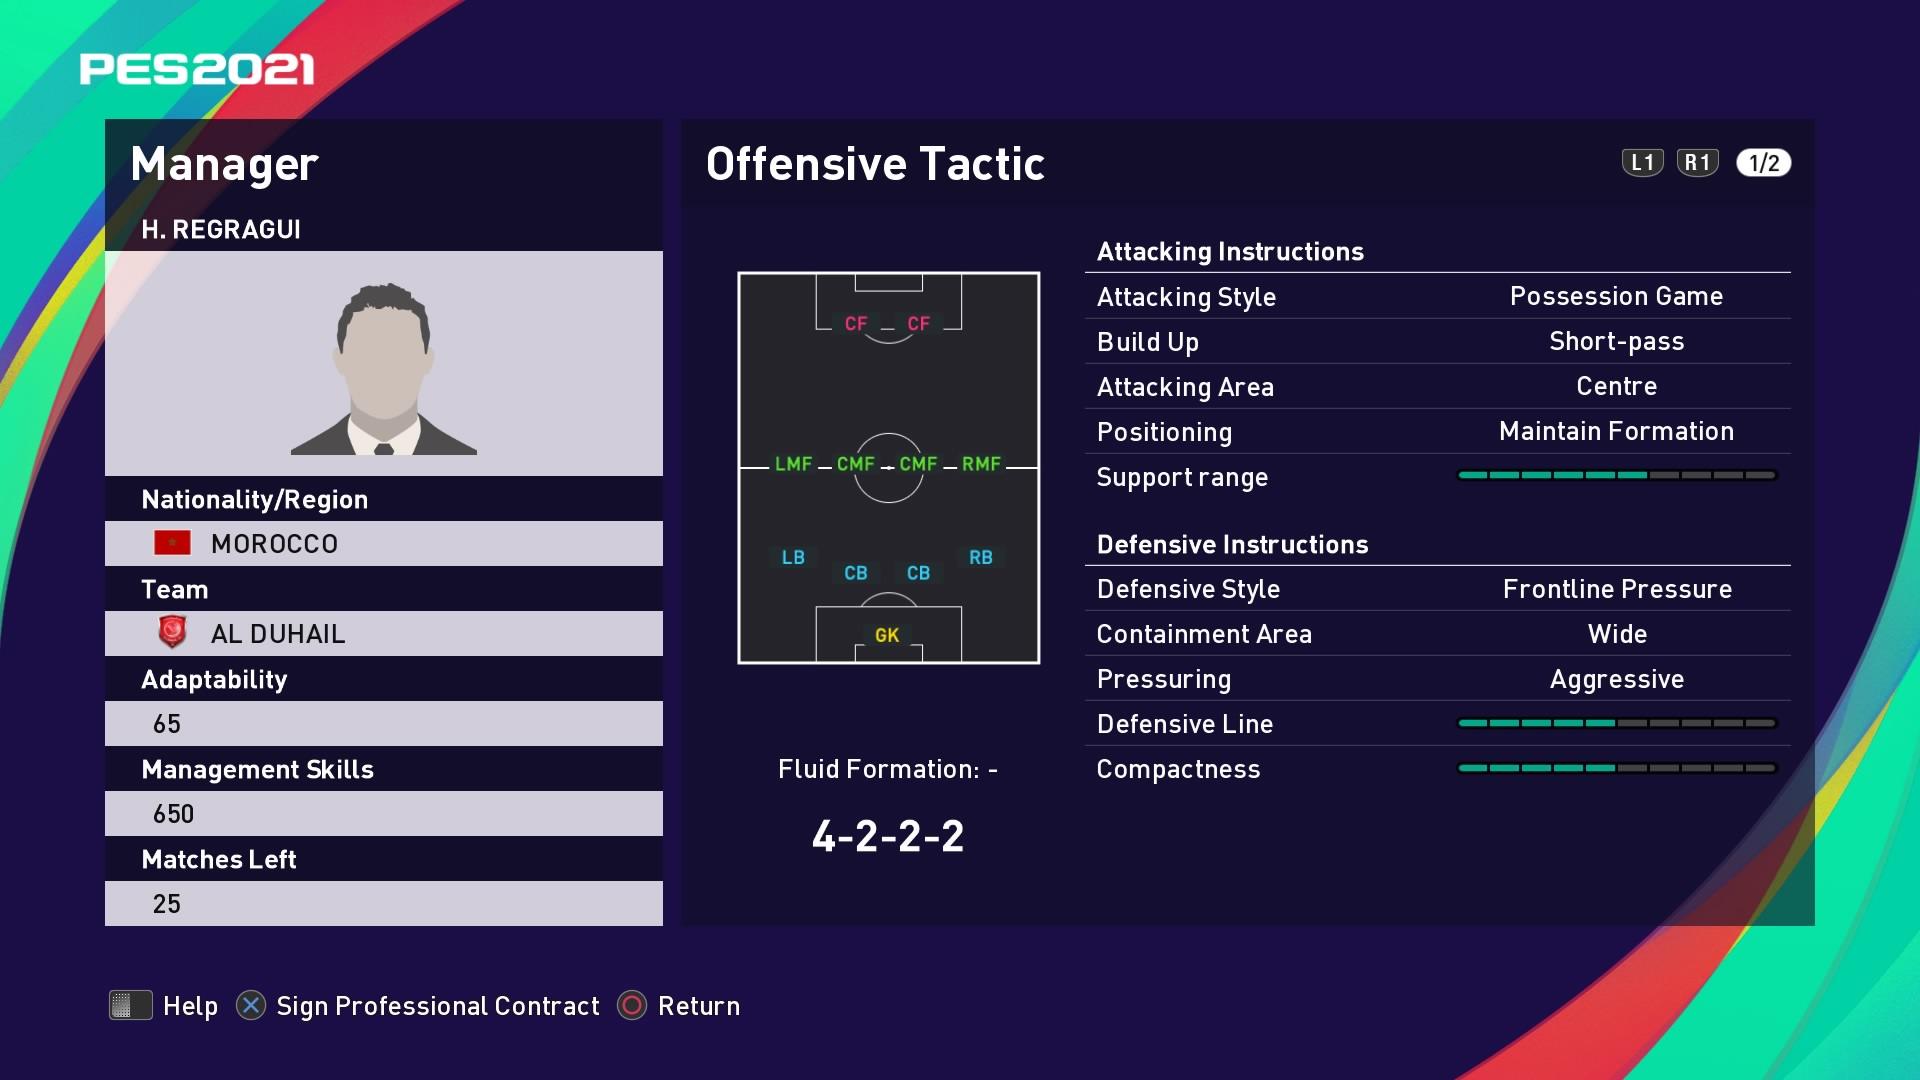 H. Regragui (Walid Regragui ) Offensive Tactic in PES 2021 myClub